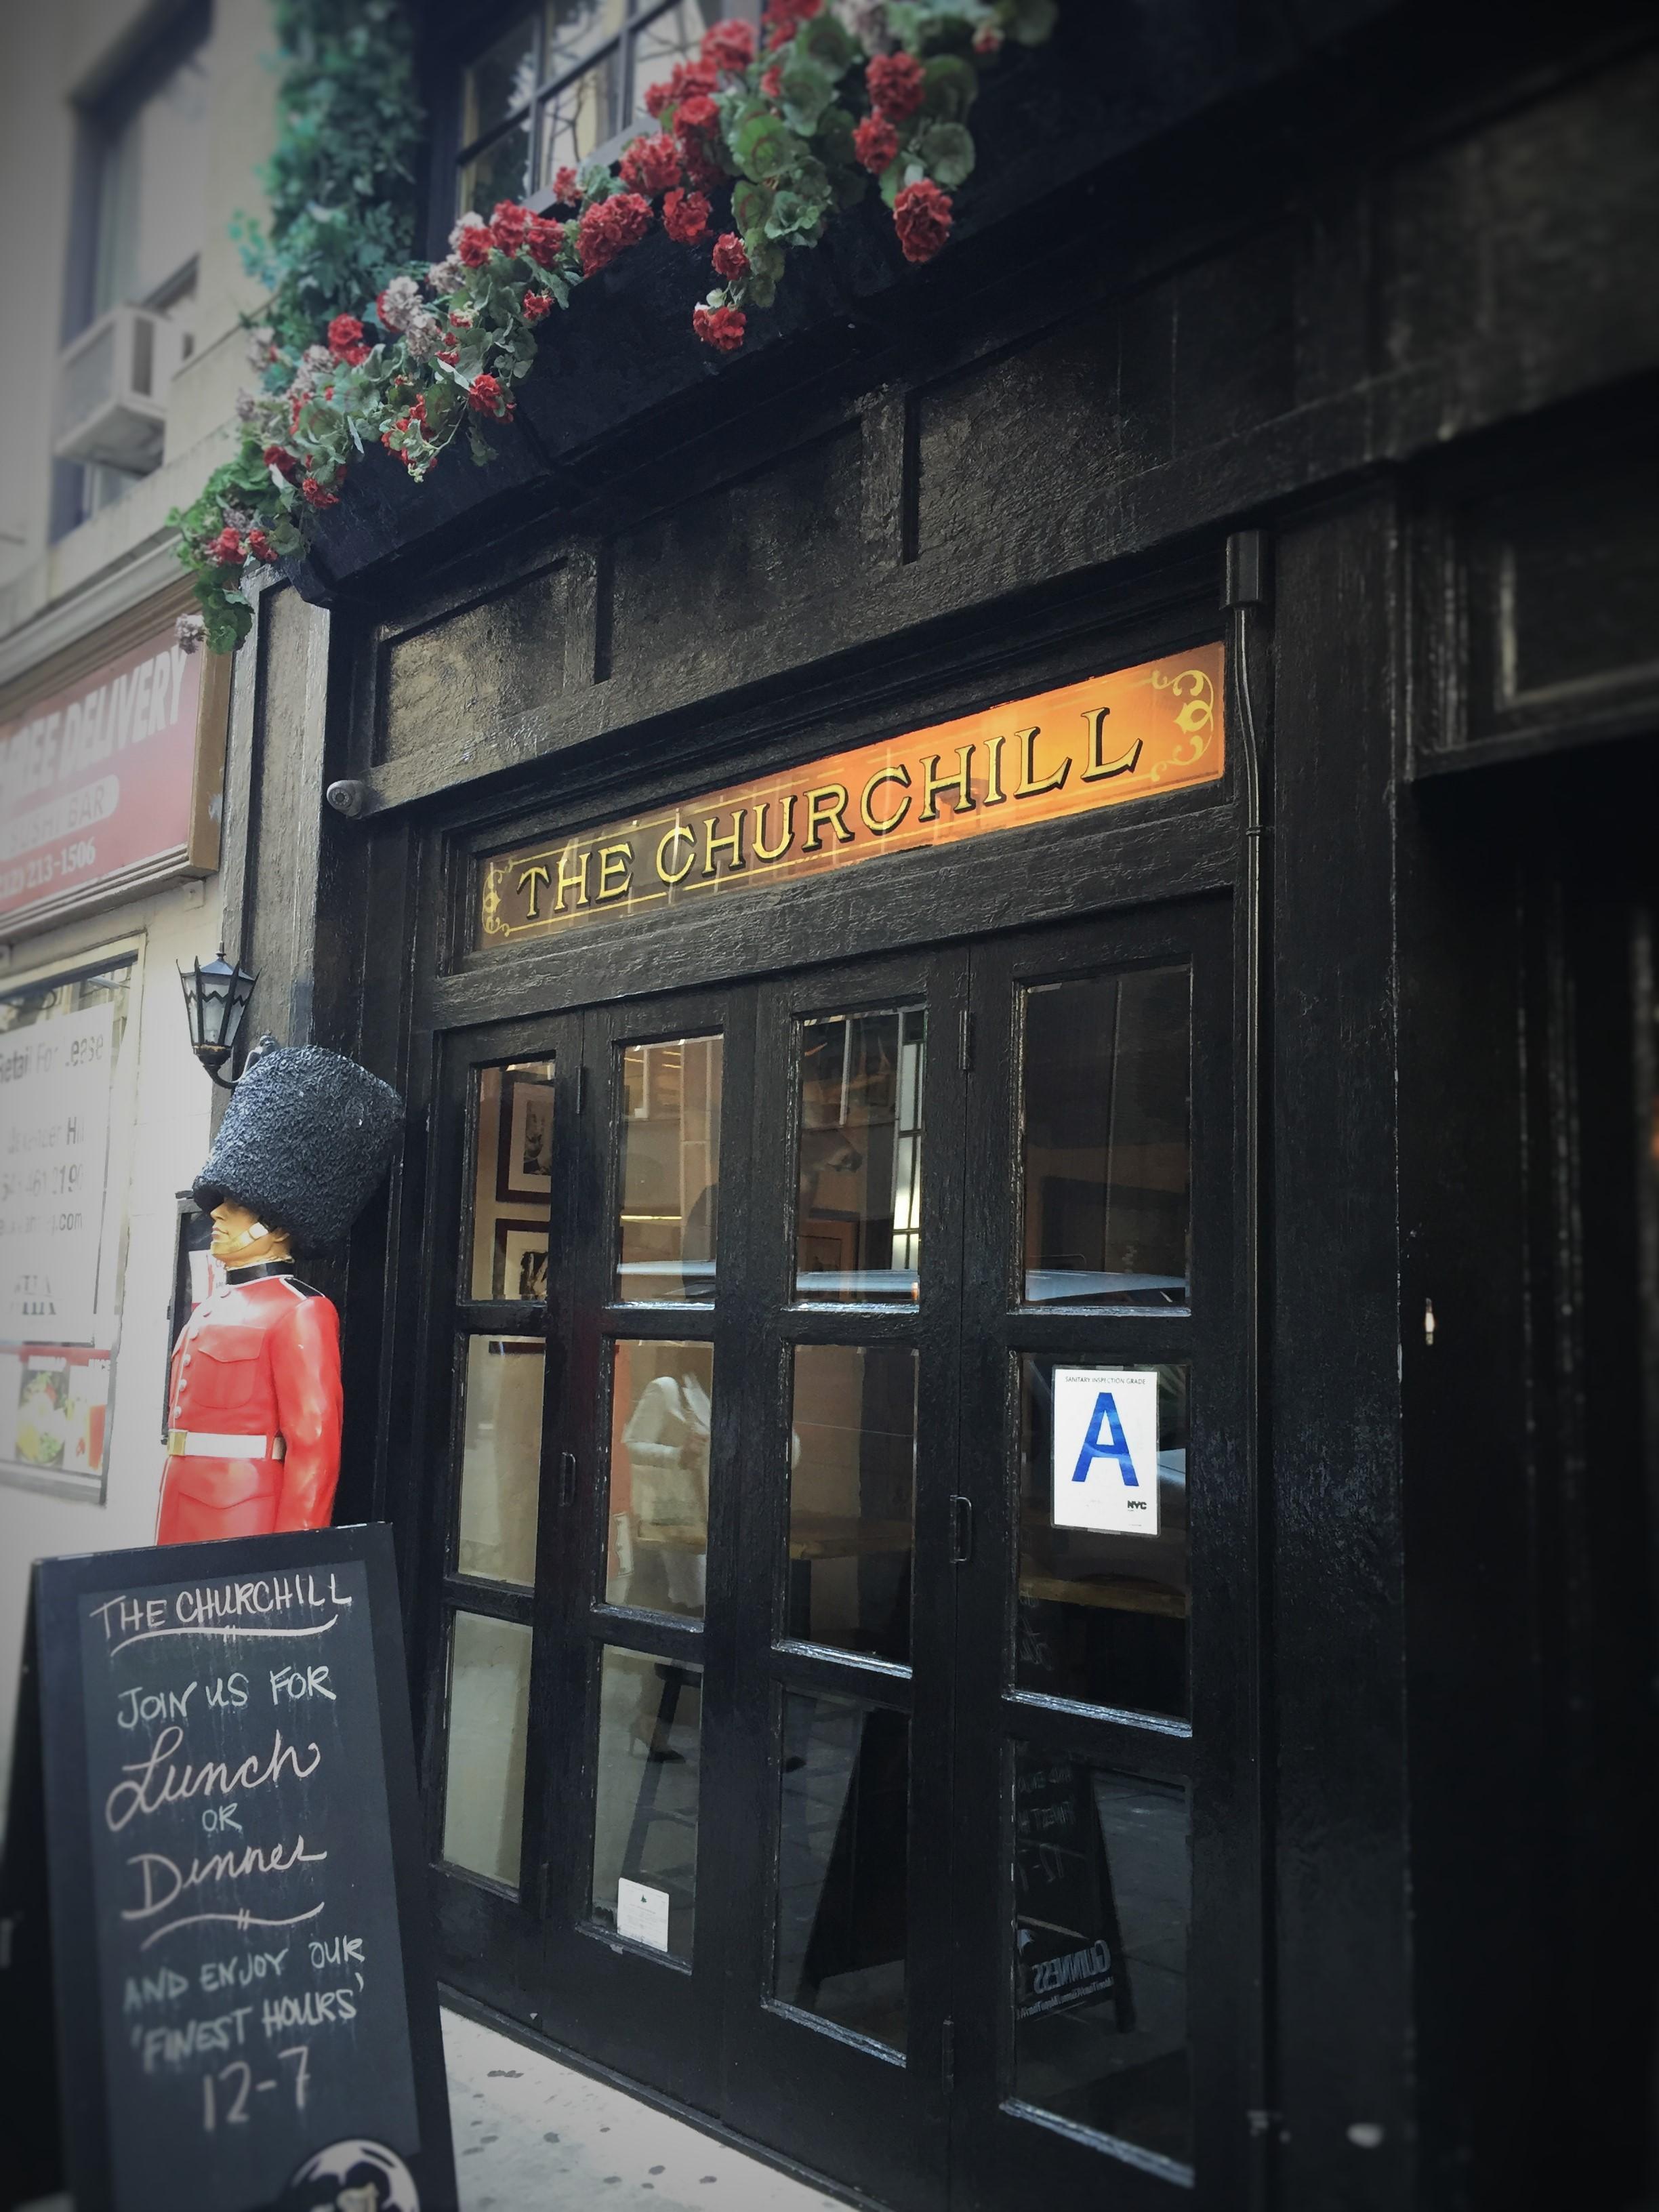 Churchill Tavern on East 28 Street in Manhattan. Photo credit: M. Ciavardini